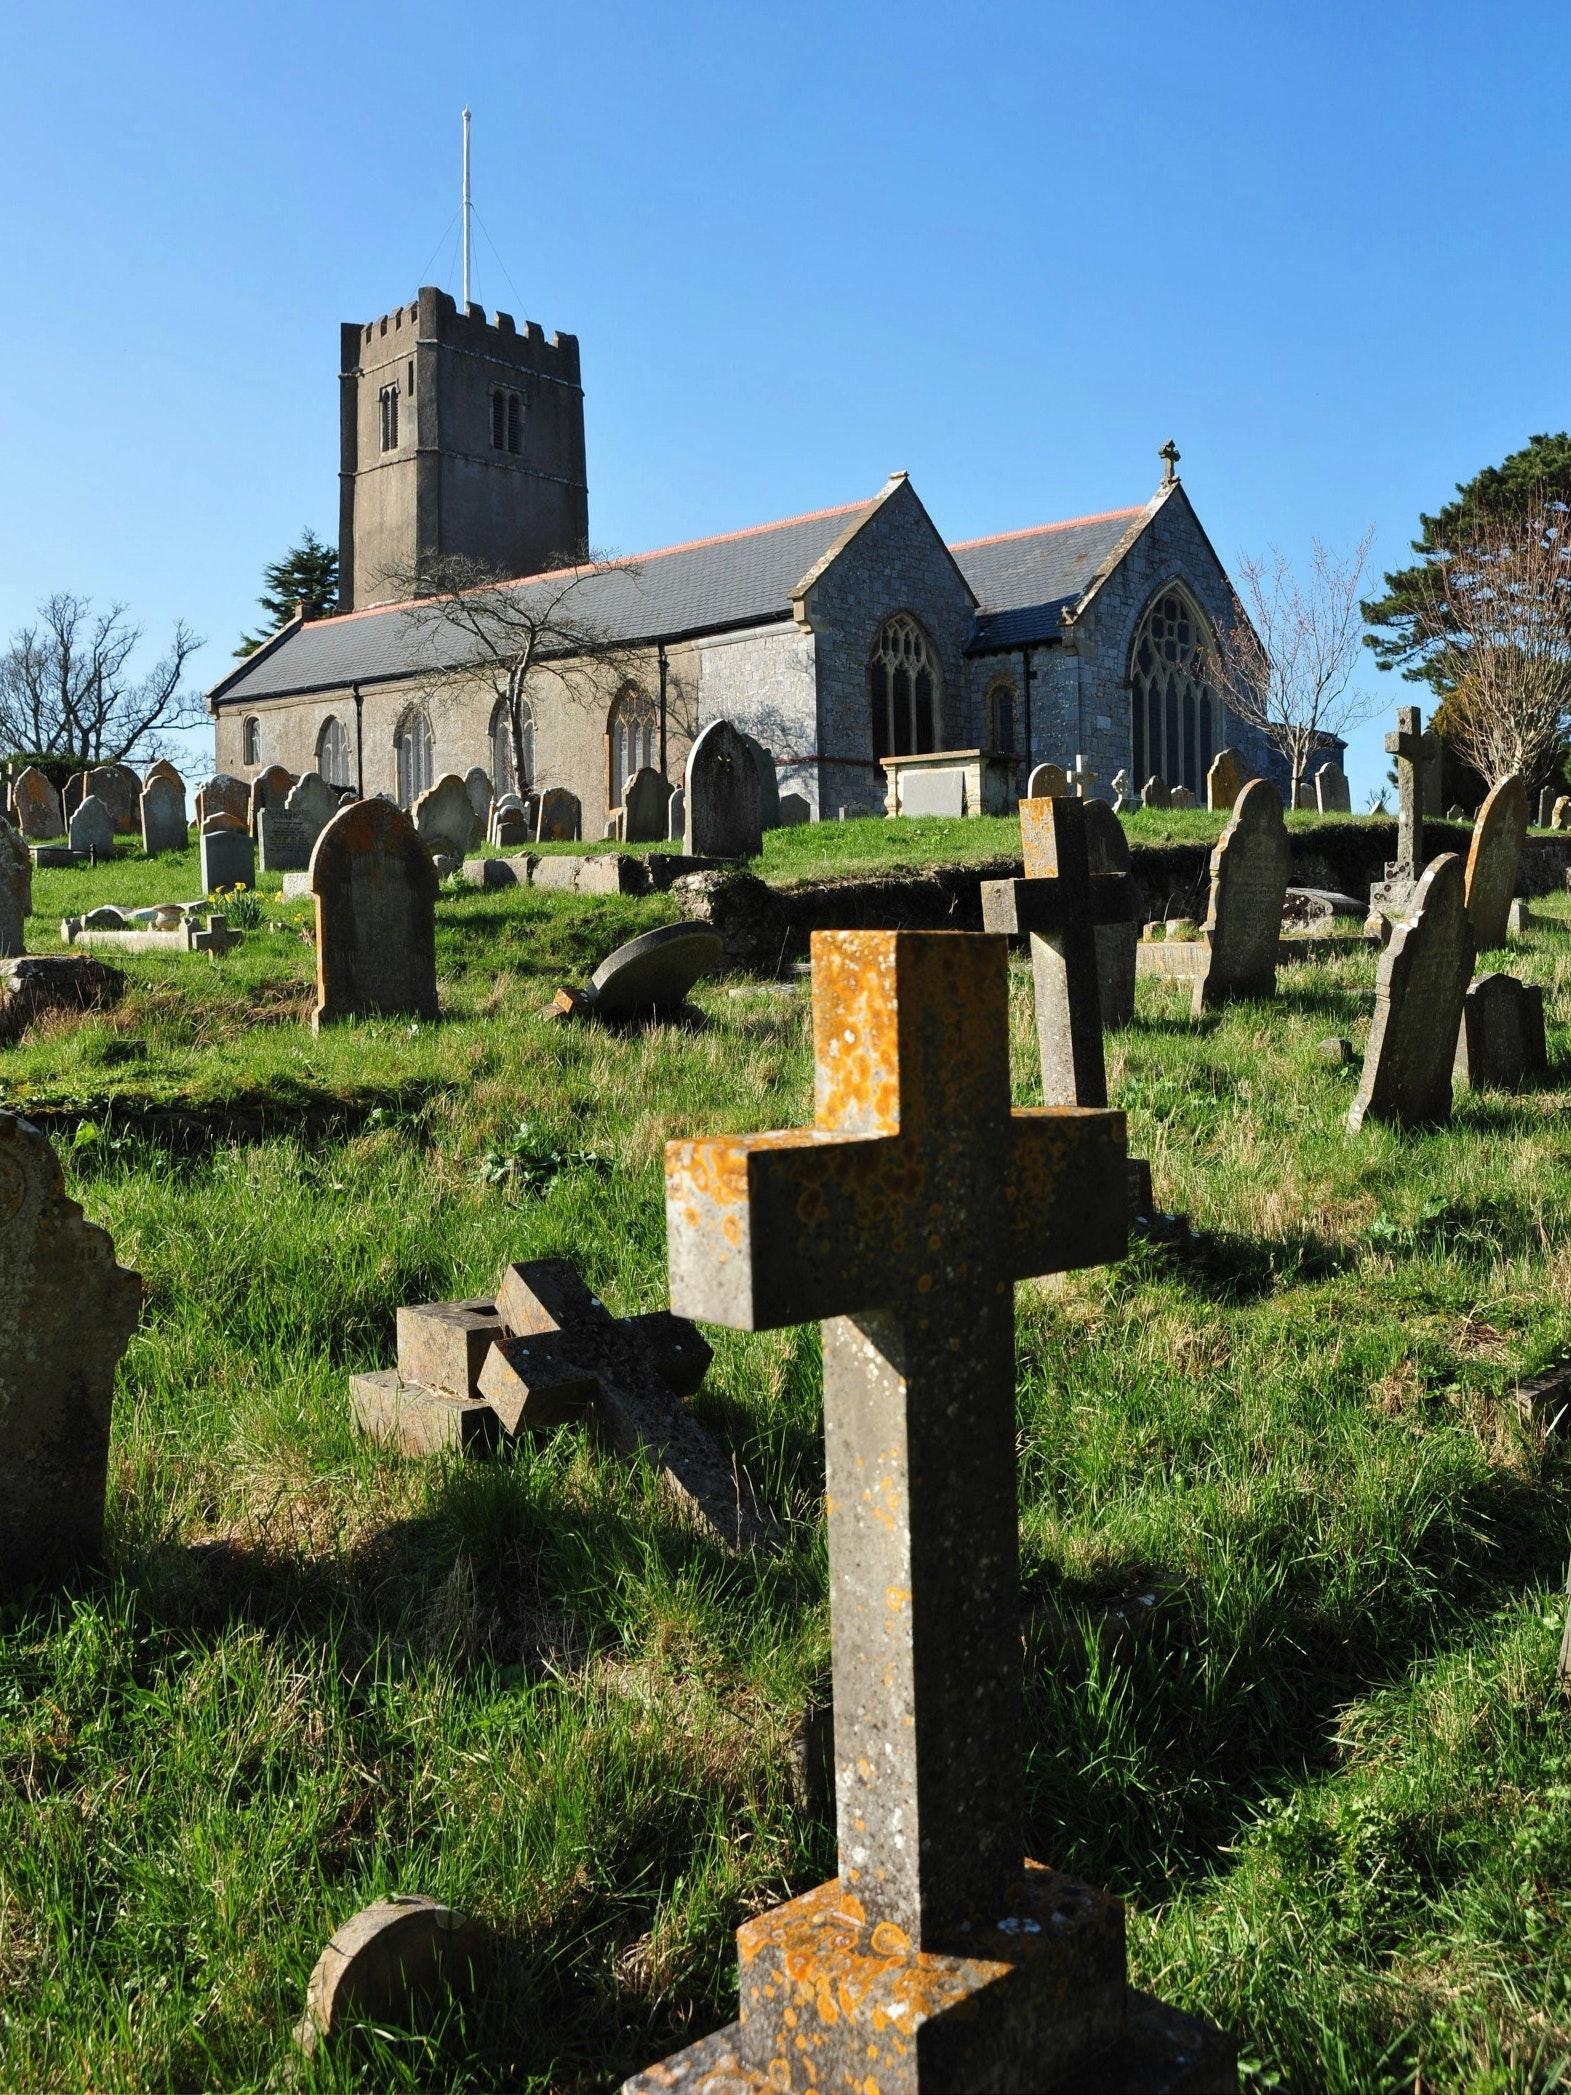 All Saints Church and its graveyard in Highweek, Devon, England.